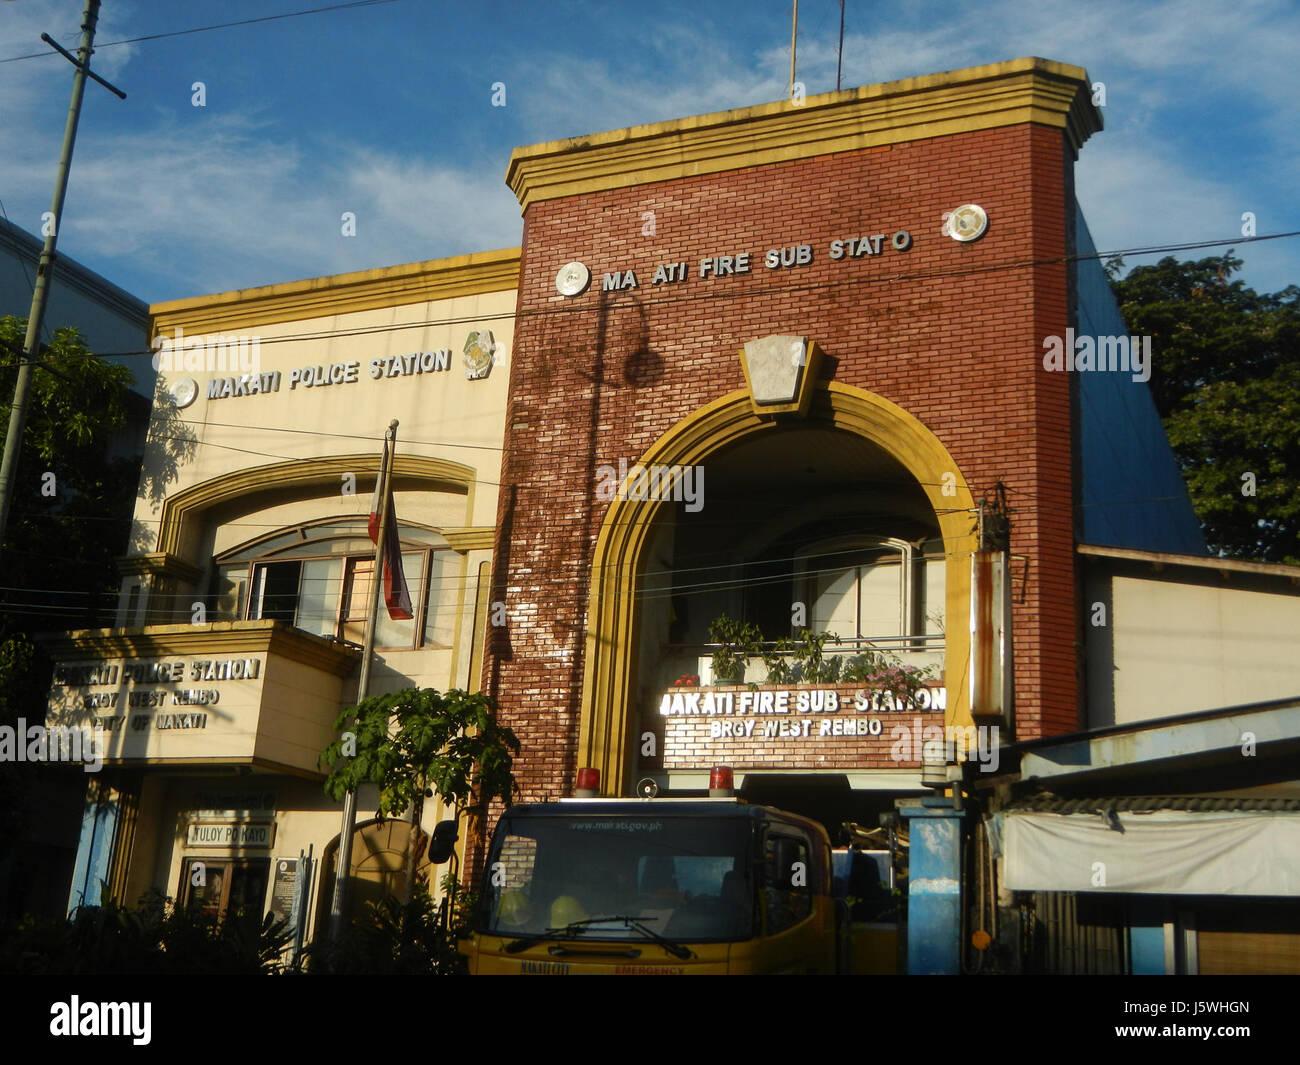 03704 Makati Park & Garden J. P. Rizal Extension West Rembo, Makati ...